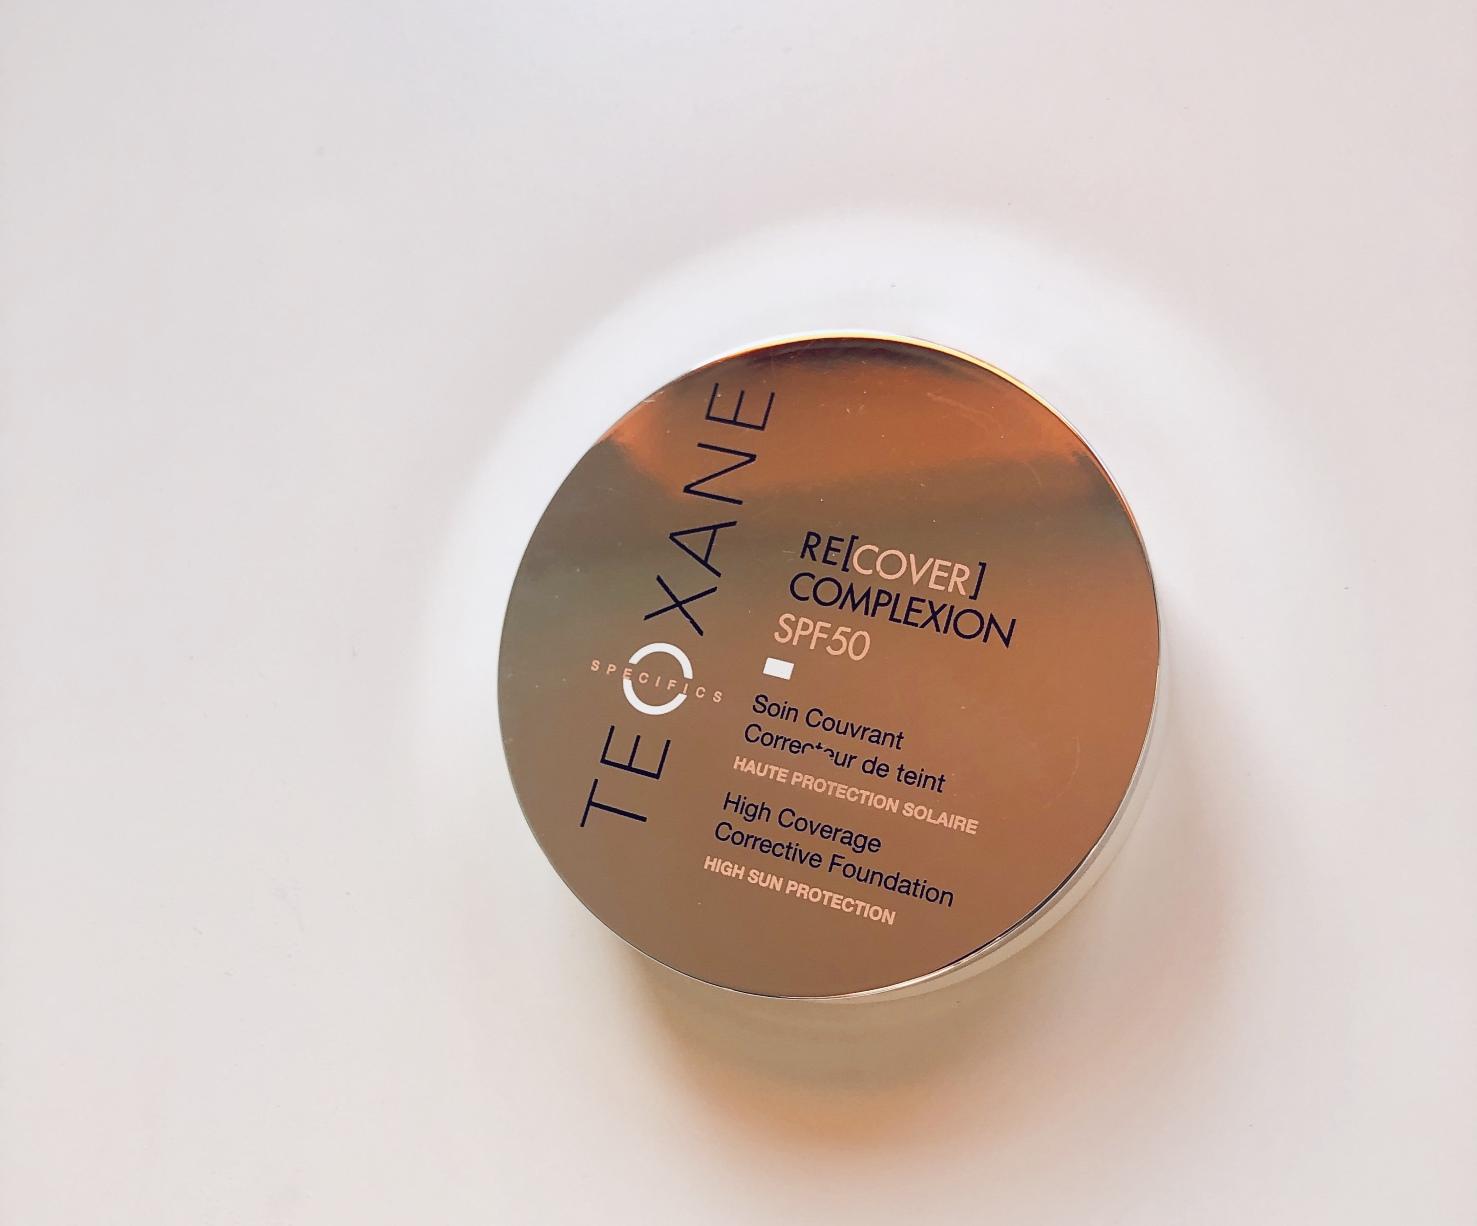 teoxane recover complexion